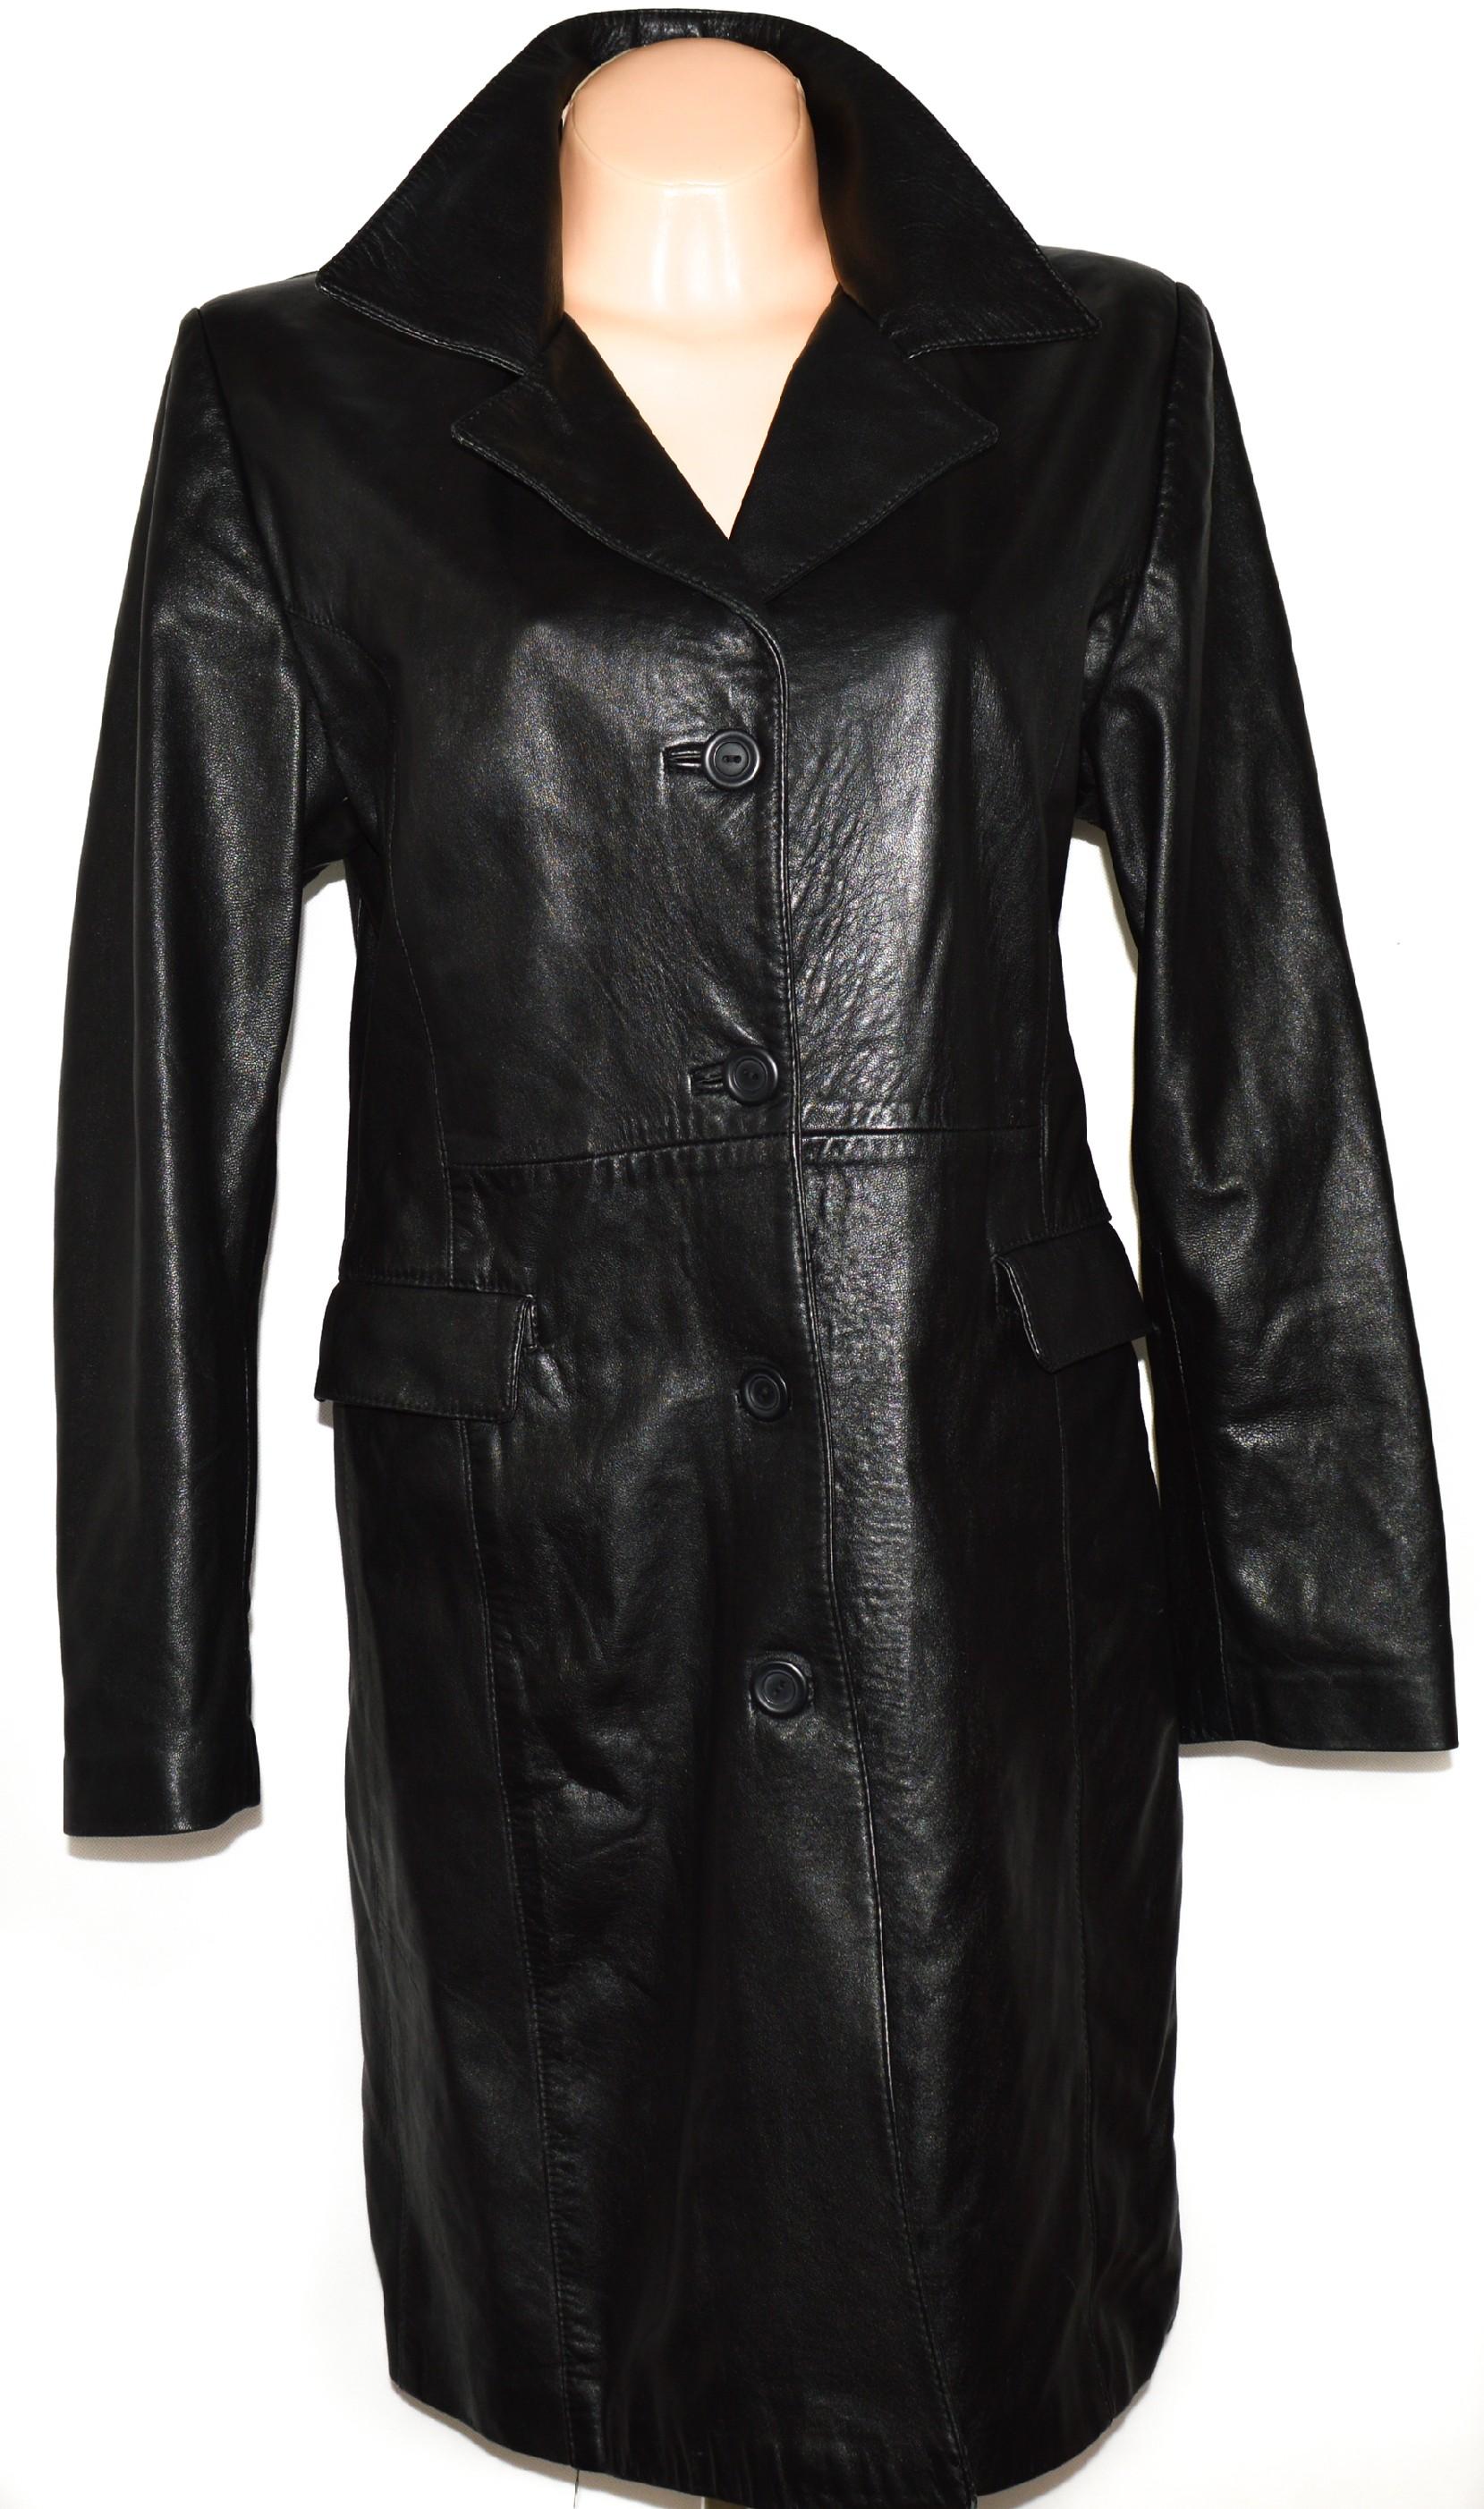 16e596f9dfbb KOŽENÝ dámský měkký černý kabát FIRENZE L